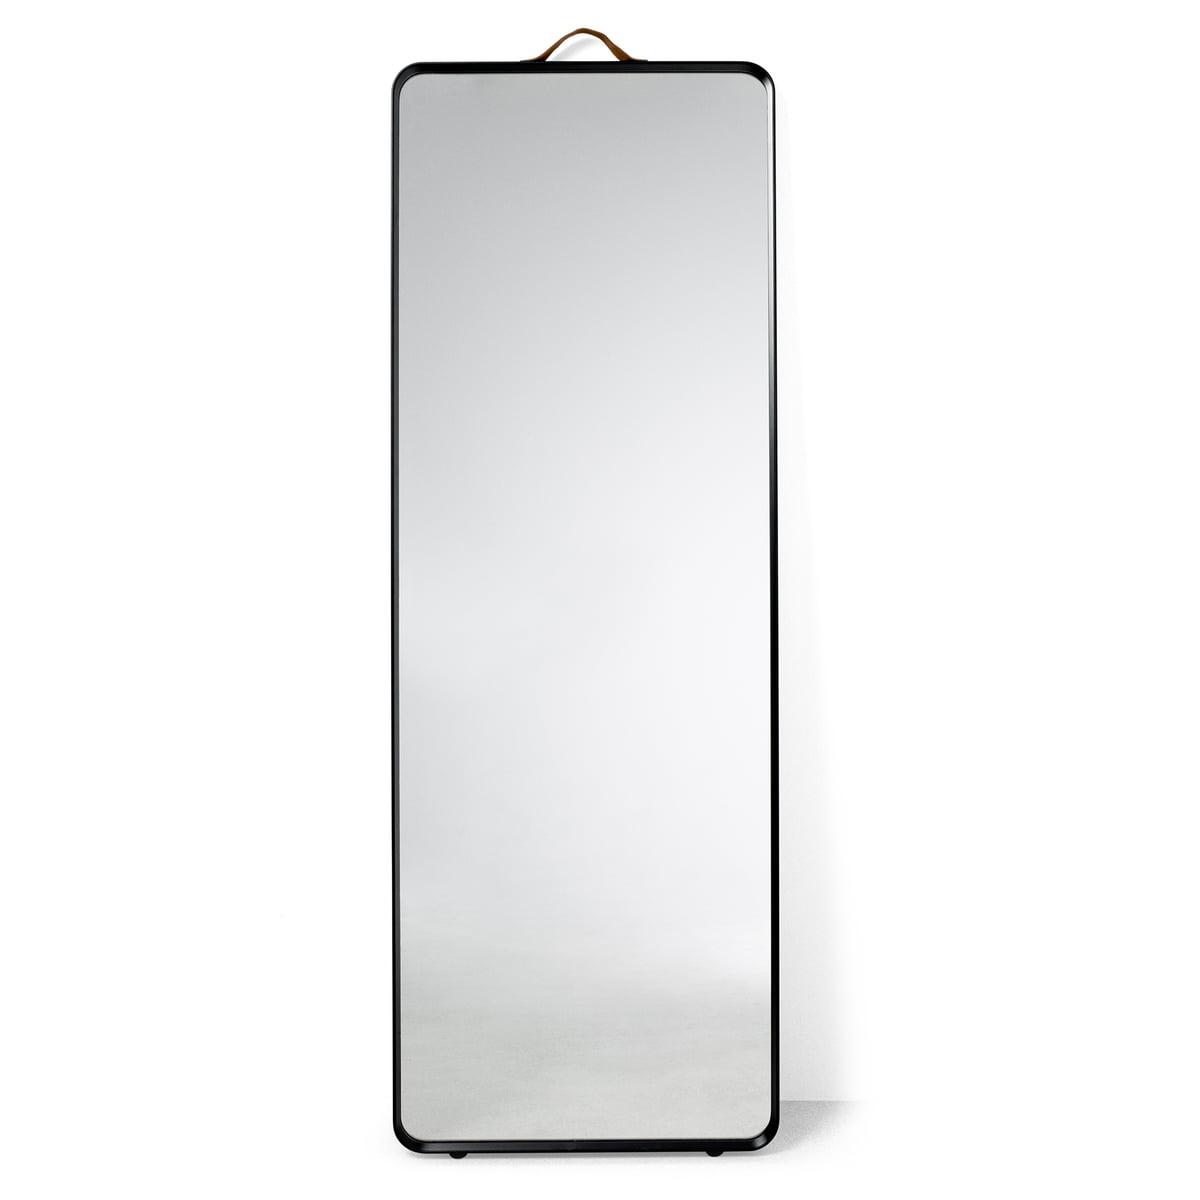 Norm floor mirror by menu connox shop for Spiegel international